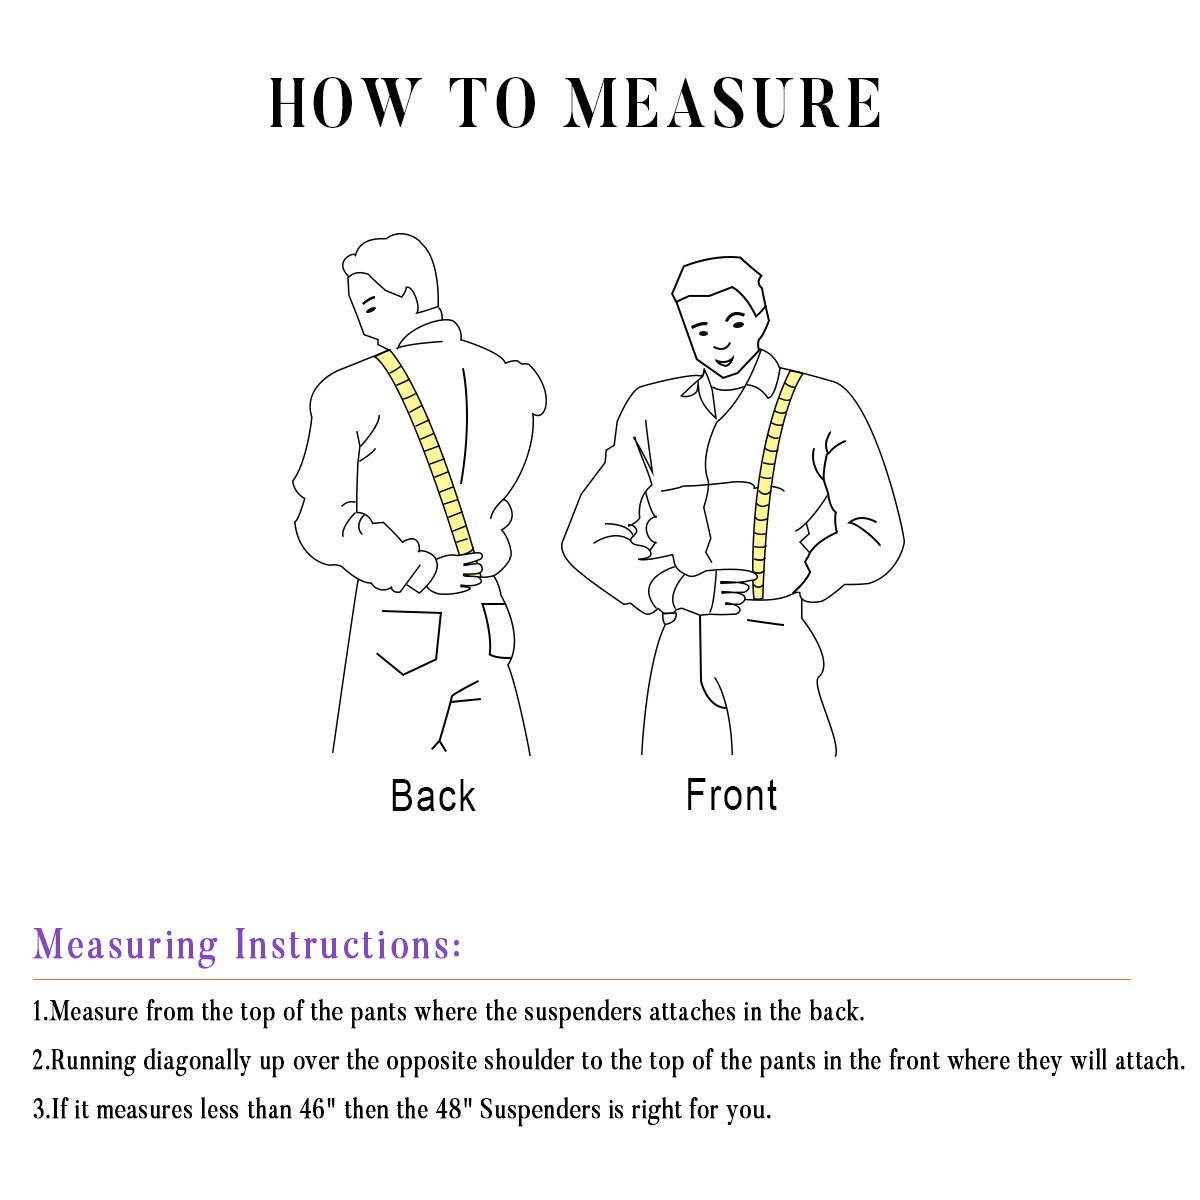 Mens X-Back Heavy Duty Work Suspenders 2pc Adjustable Elastic Clip Suspenders (Black/Navy Blue) One Size by GradeCode (Image #6)